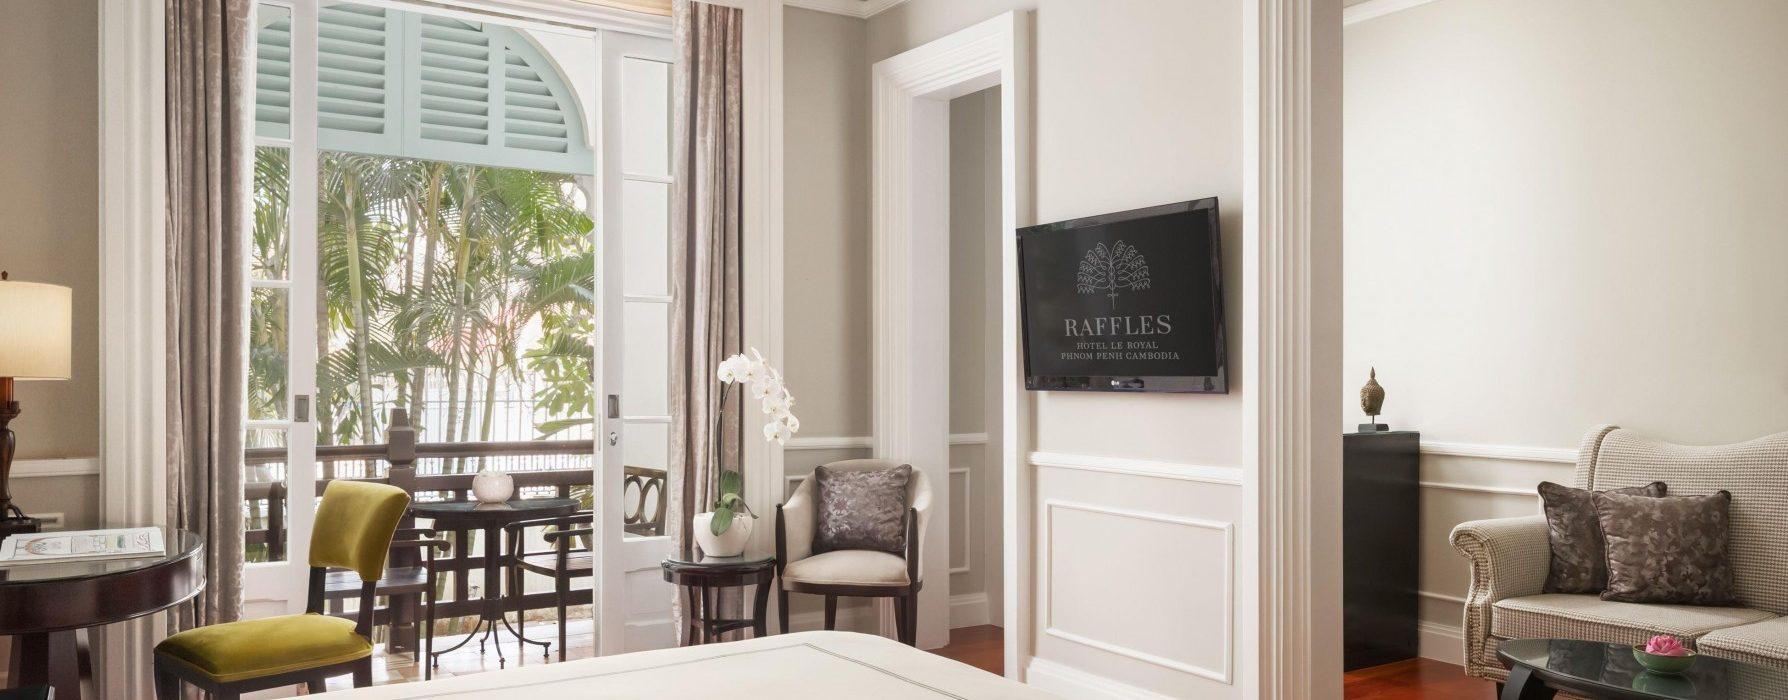 Raffles Hotel Le Royal Phnom Penh - Luxury Reborn, the New Raffles Offer